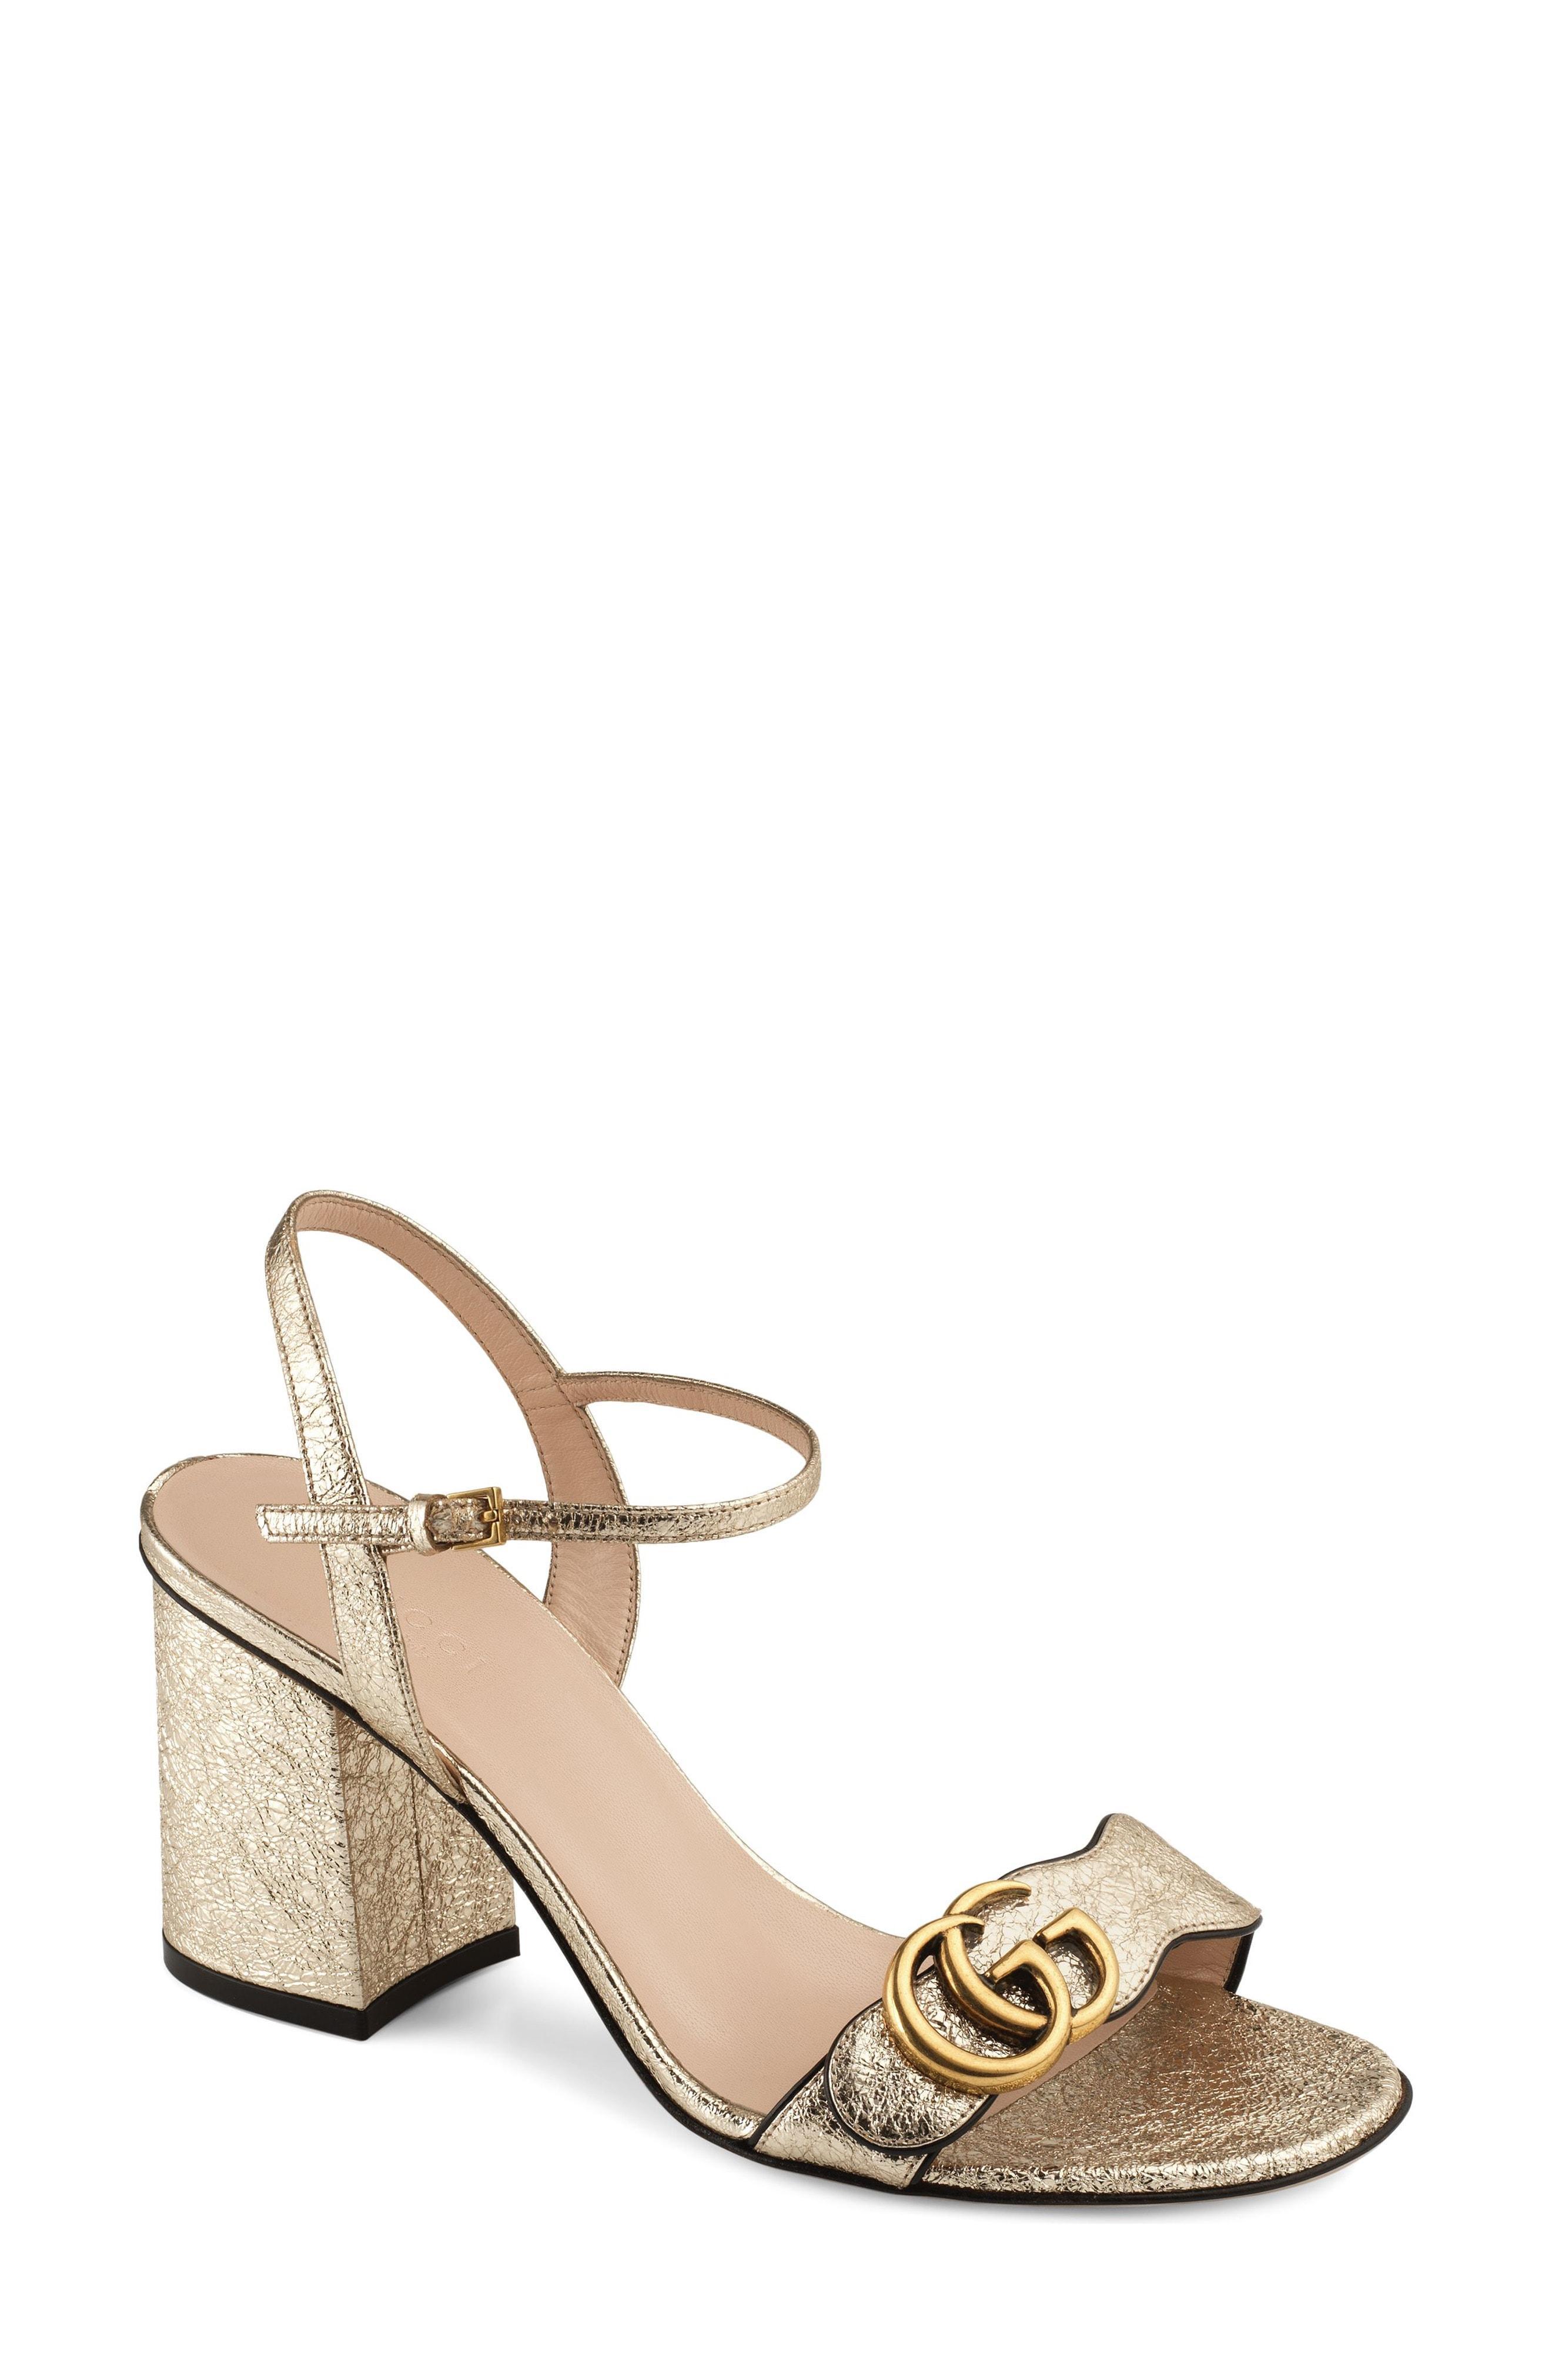 0a1cfc096ed Gucci. Women s Gg Marmont Sandal